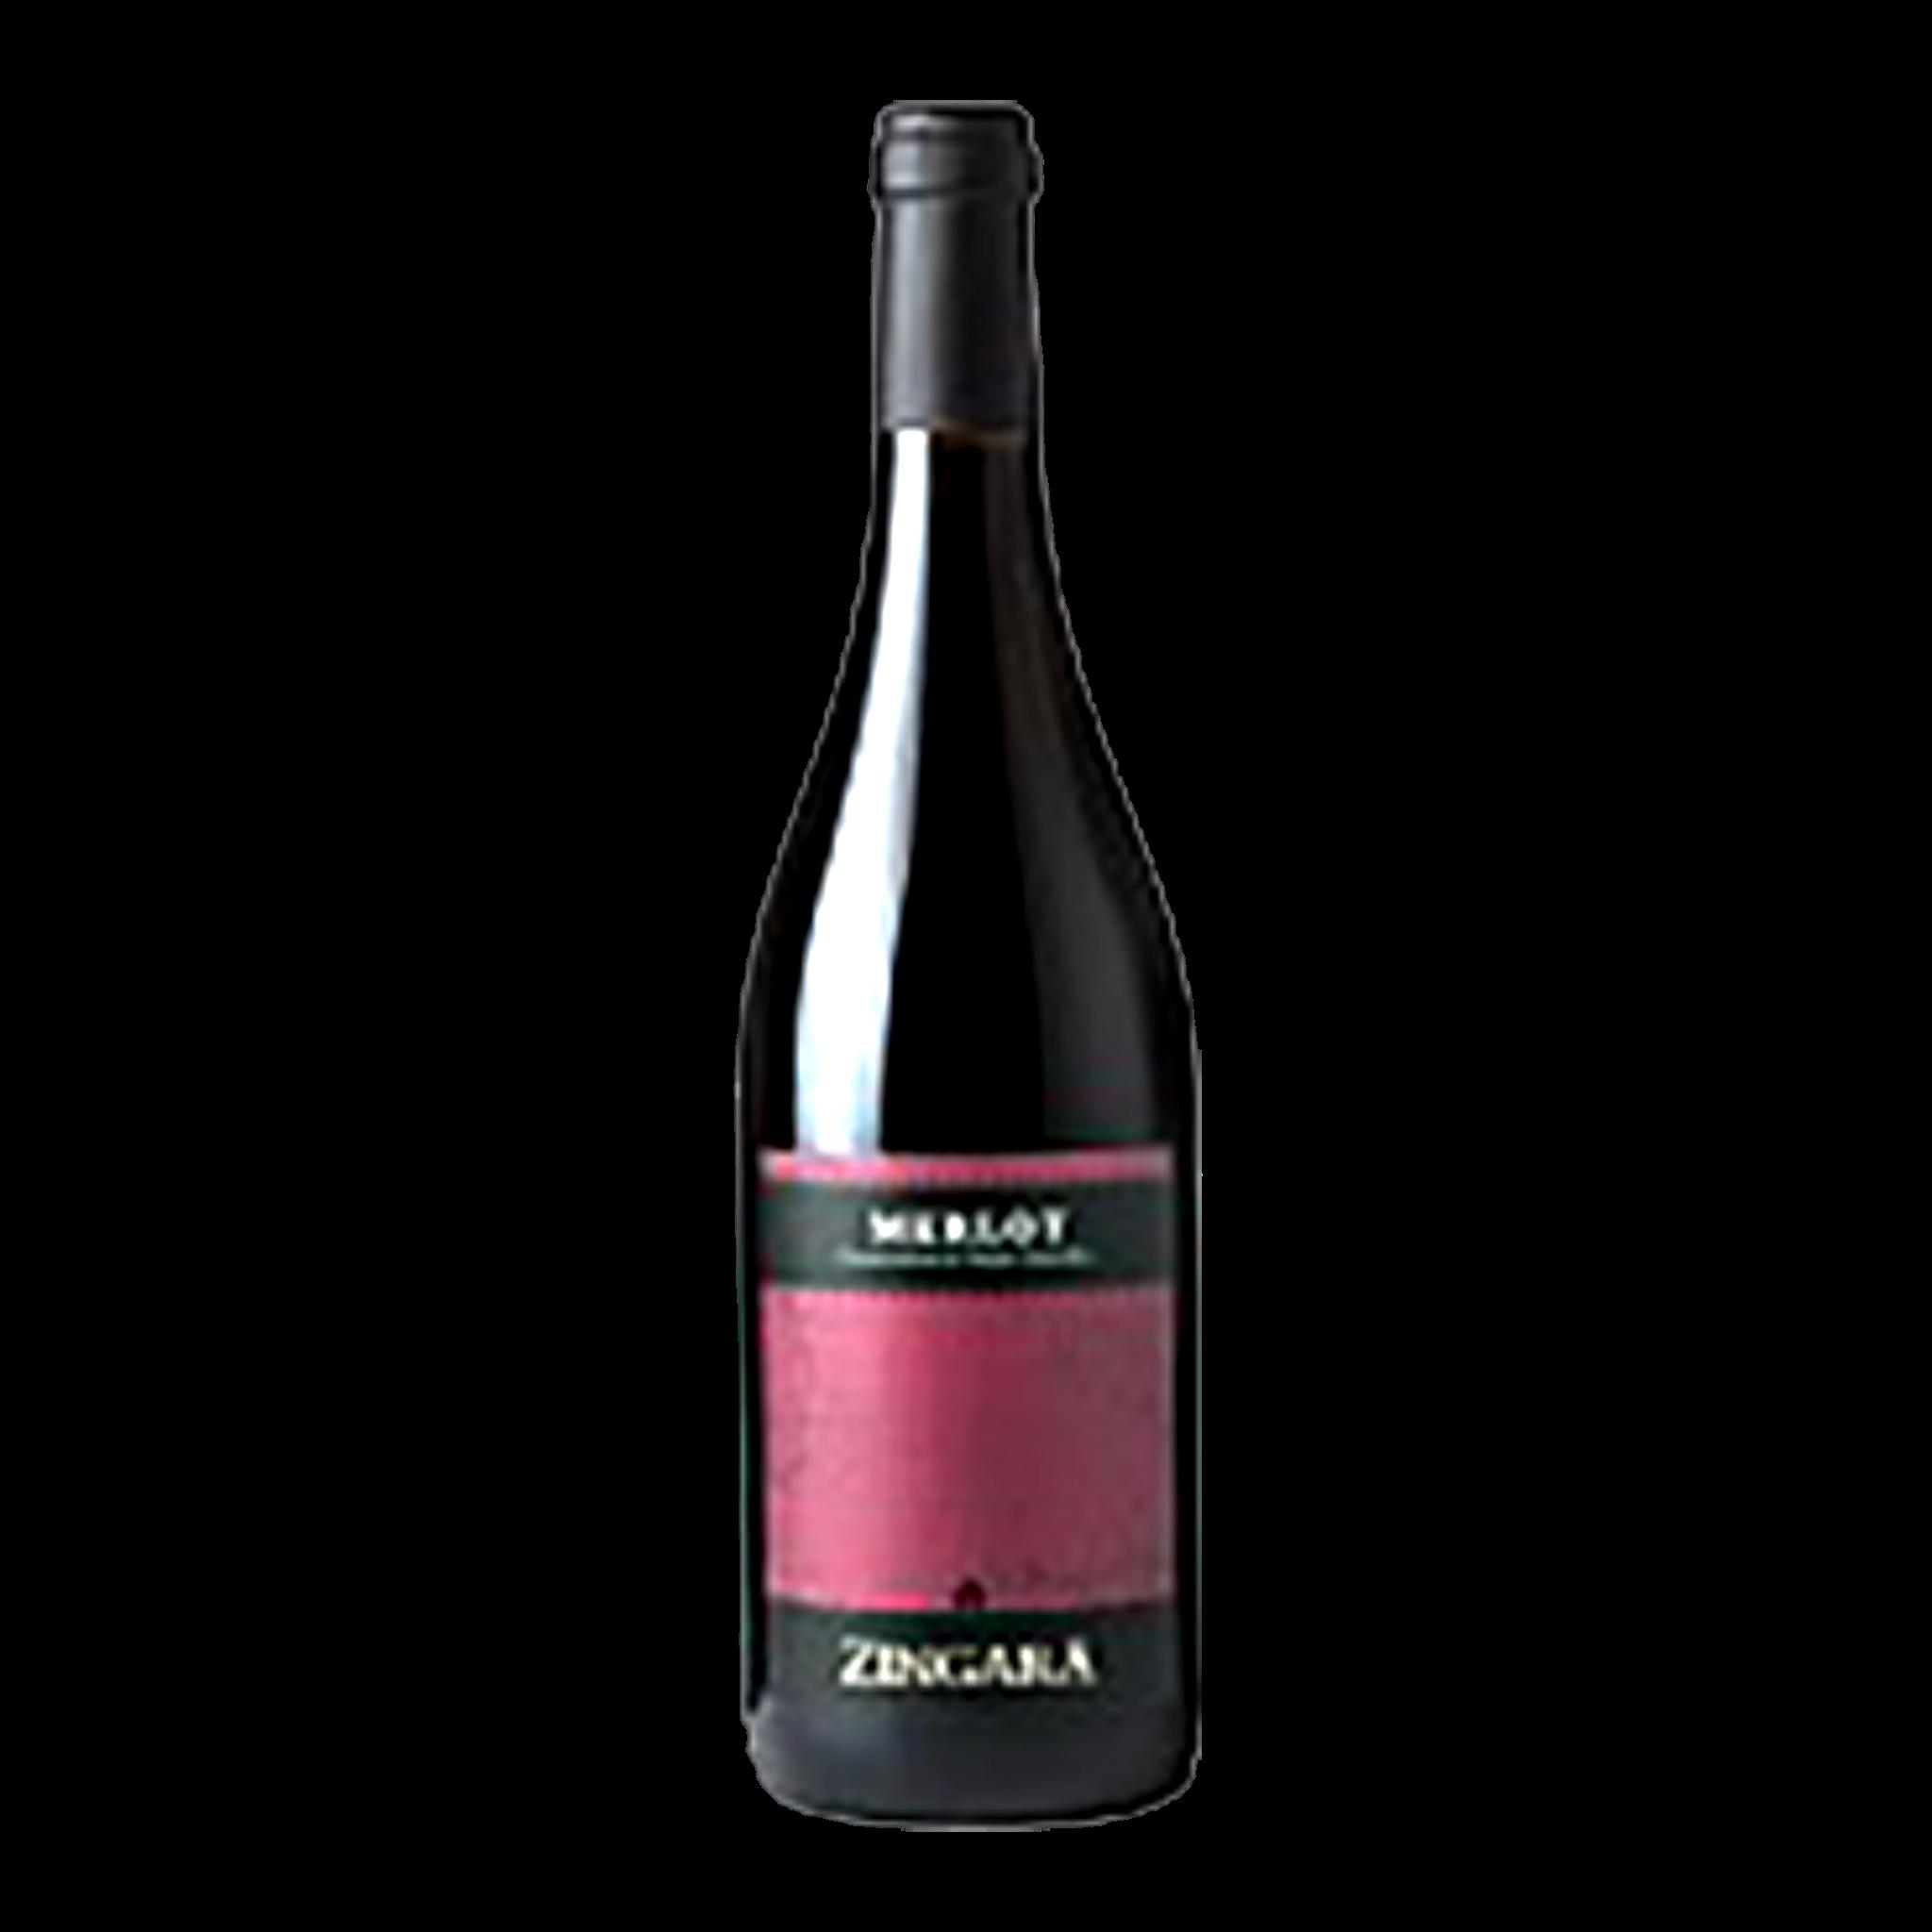 Zingara Merlot Wine Sales & Distribution by Beviamo International